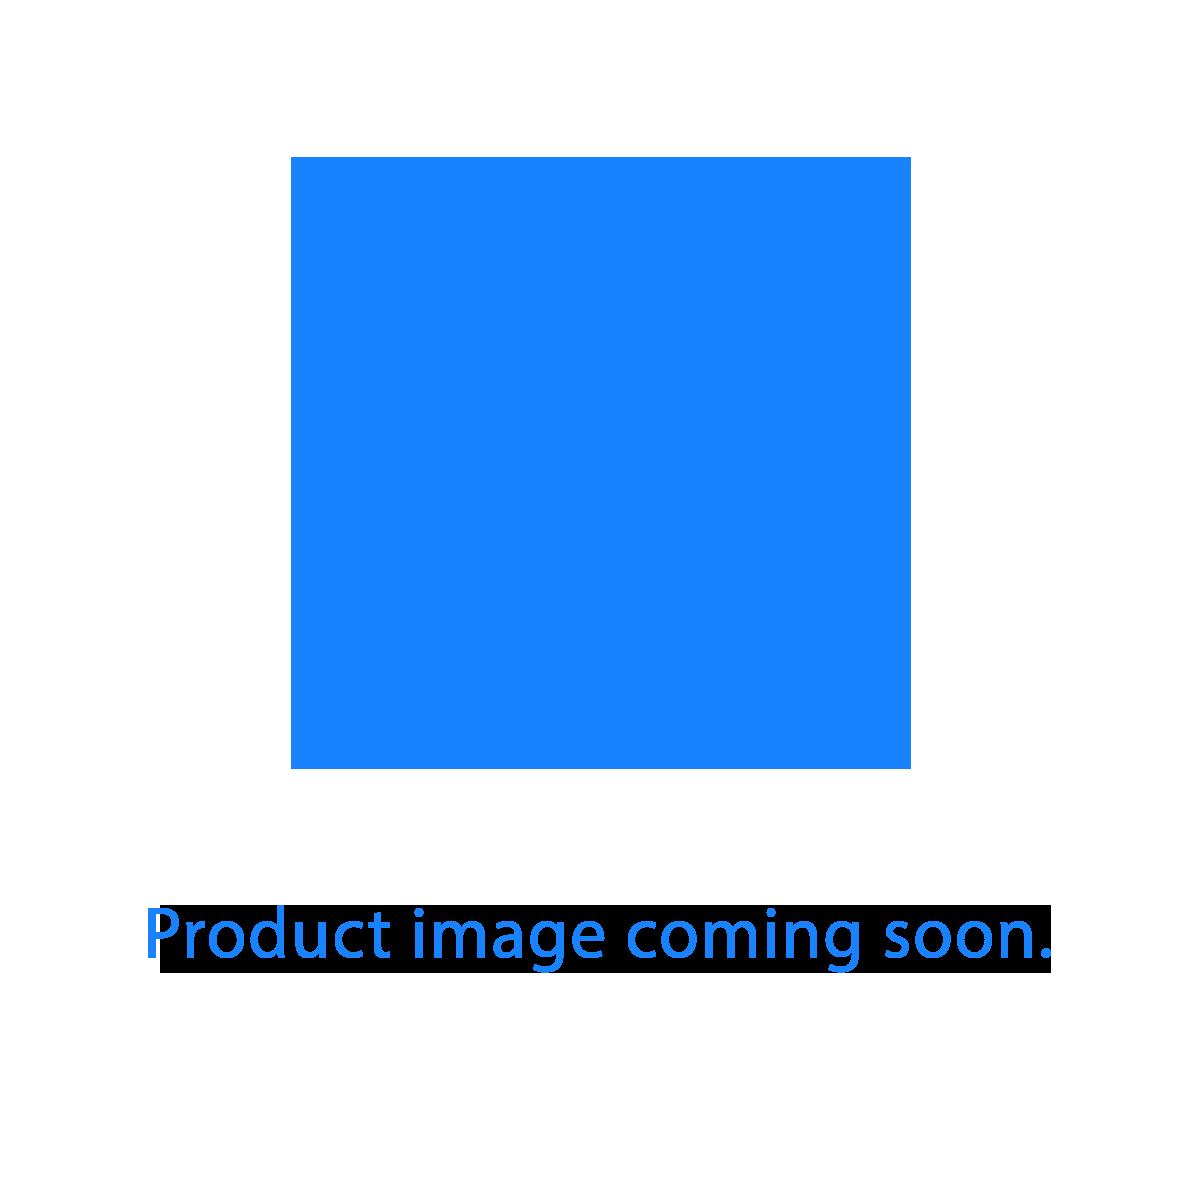 ASUS ZenBook 14 UX425JA-BM064T